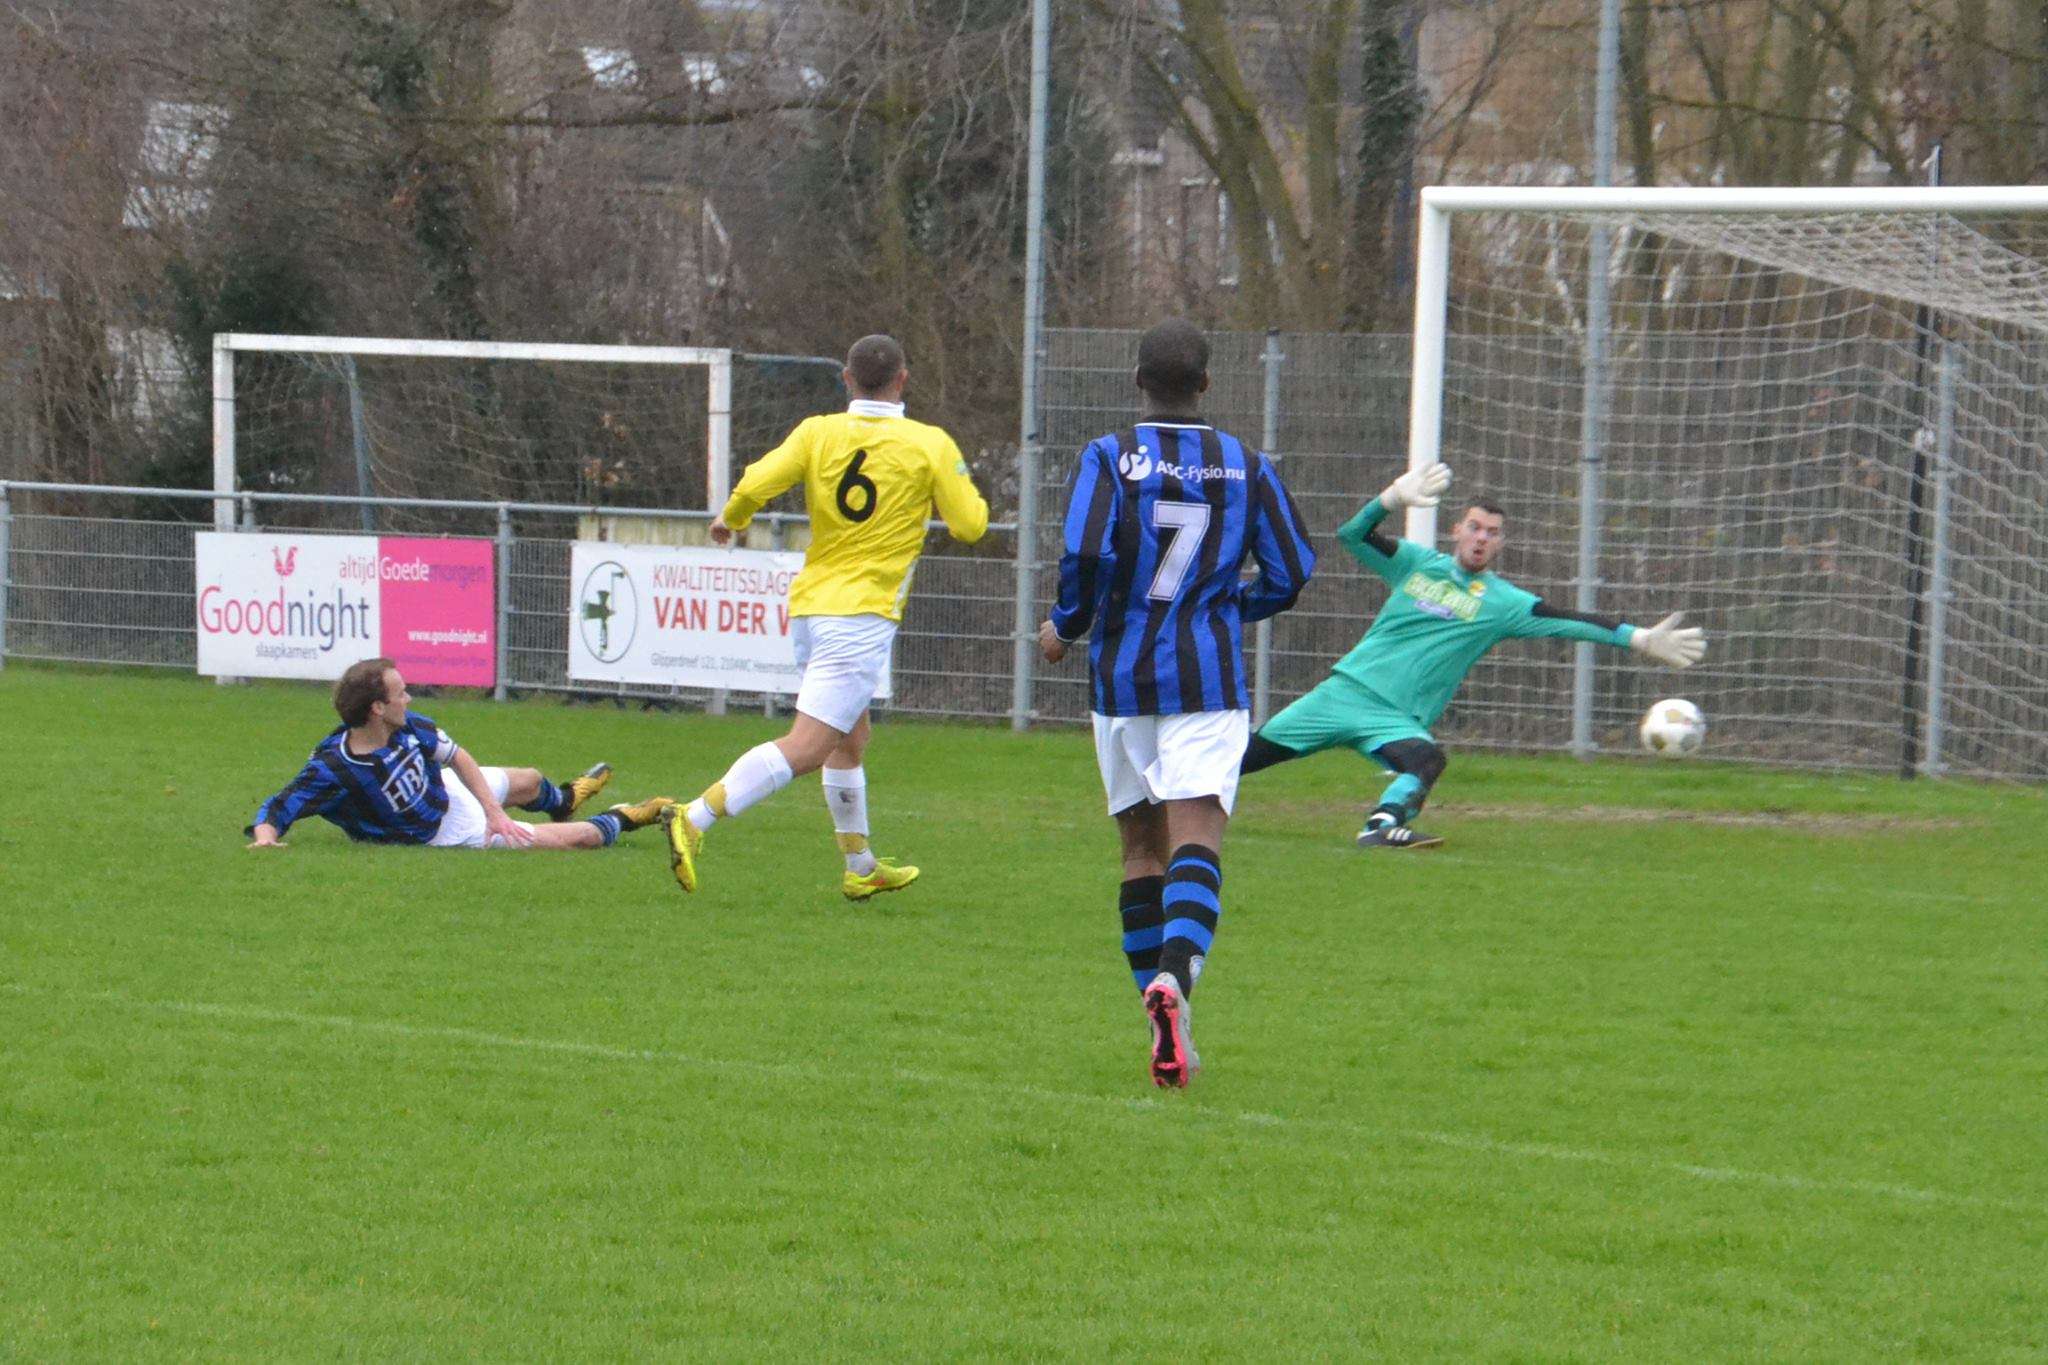 RCH - Geel-Wit - Voetbal in Haarlem